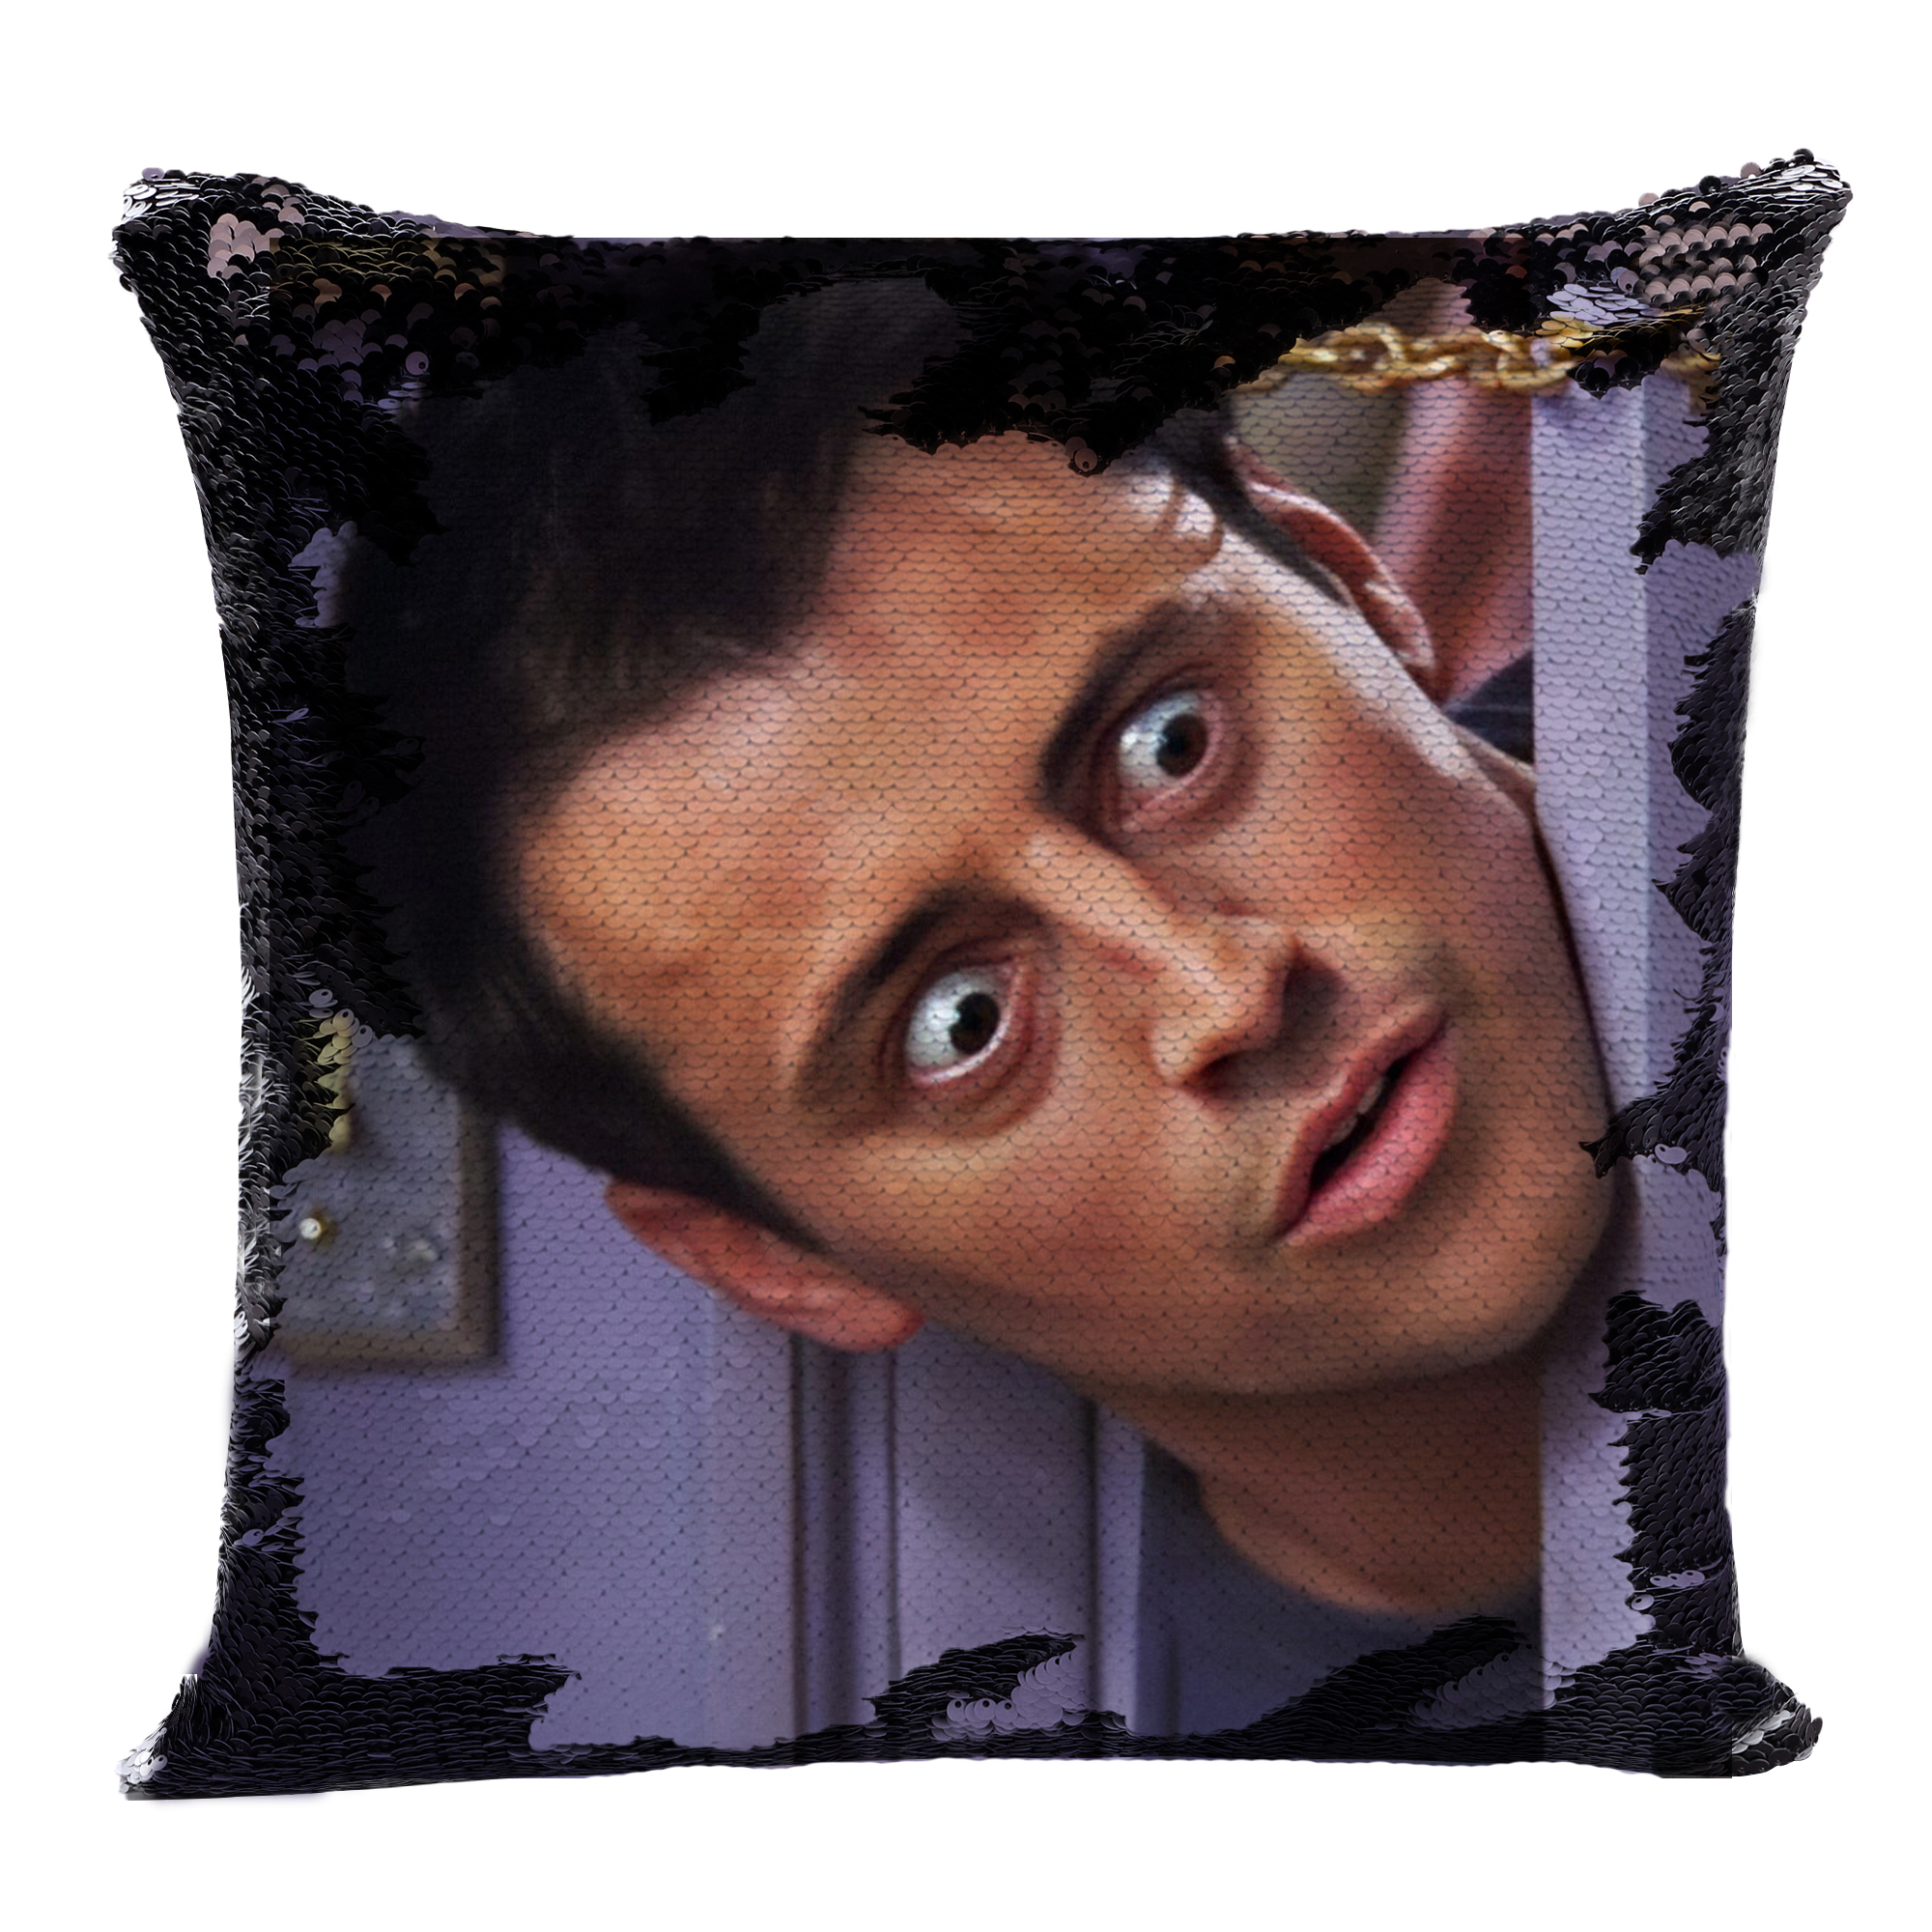 Joey Tribbiani sequin travesseiro | sequin Fronha | Duas cores travesseiro | presente para ela | presente para ele | magia travesseiro Amigos TV Show